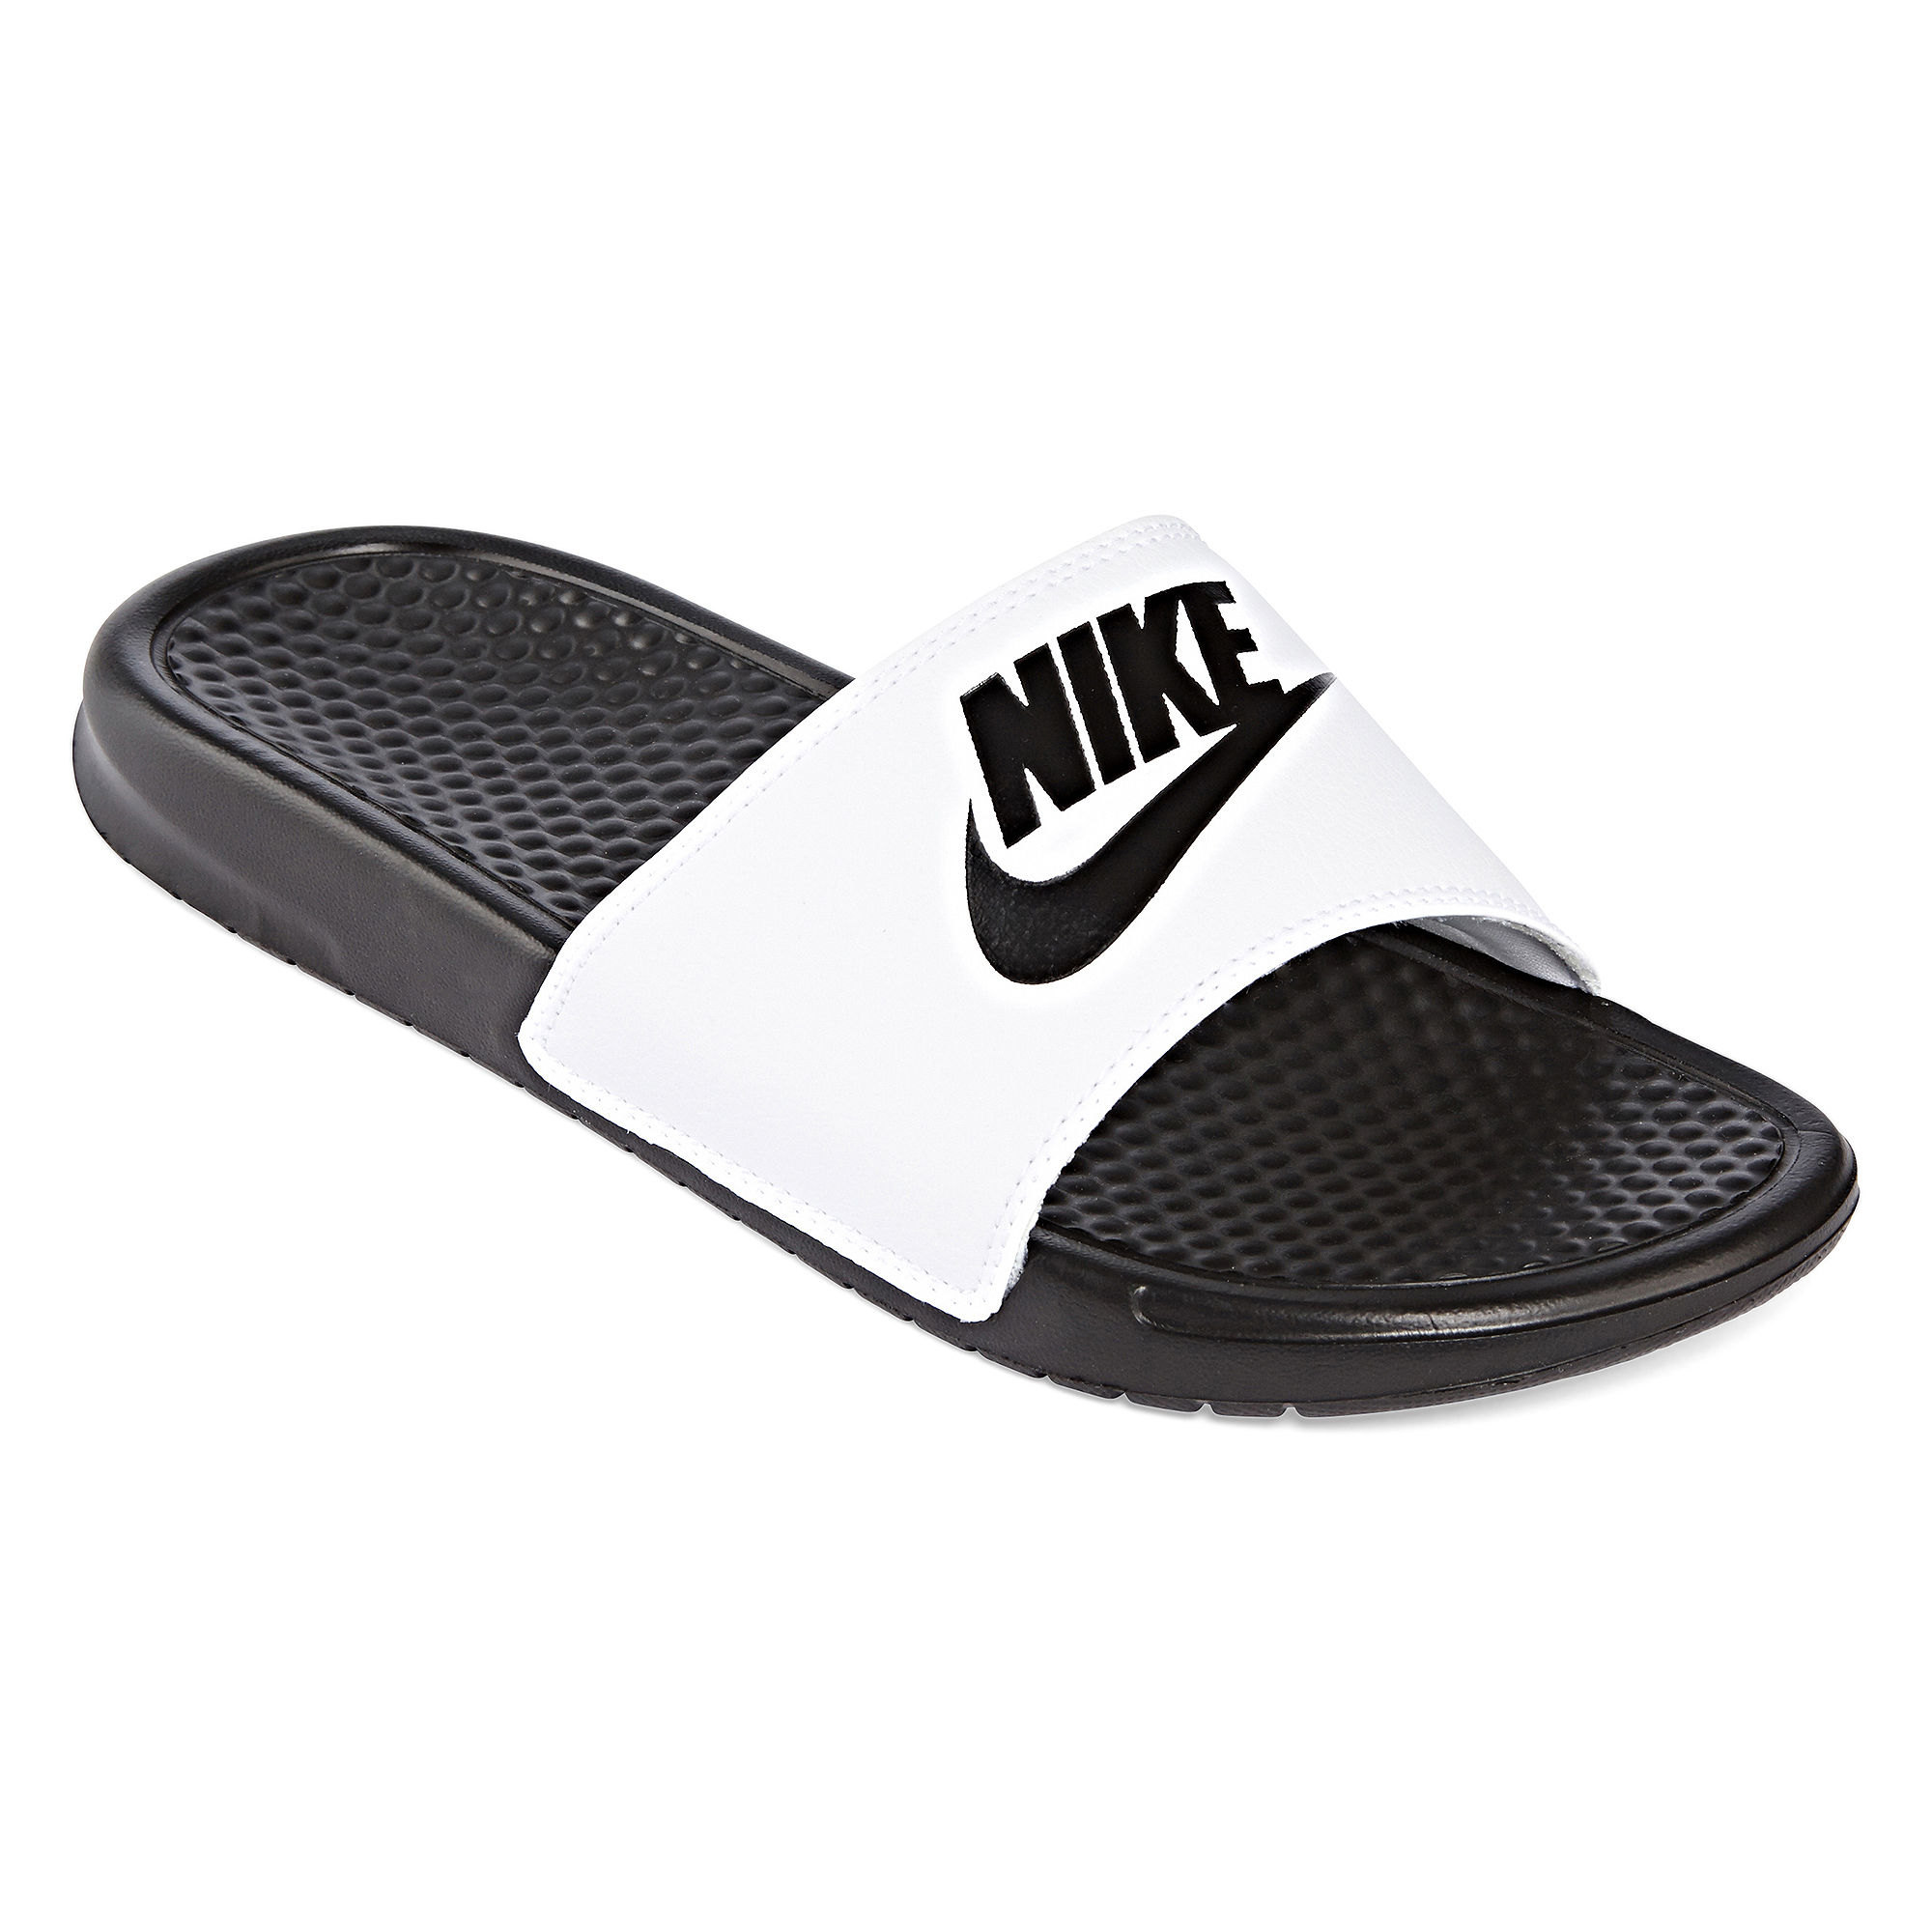 885176767458 UPC - Nike Benassi Jdi Men's Slide Sandals (White)   UPC Lookup